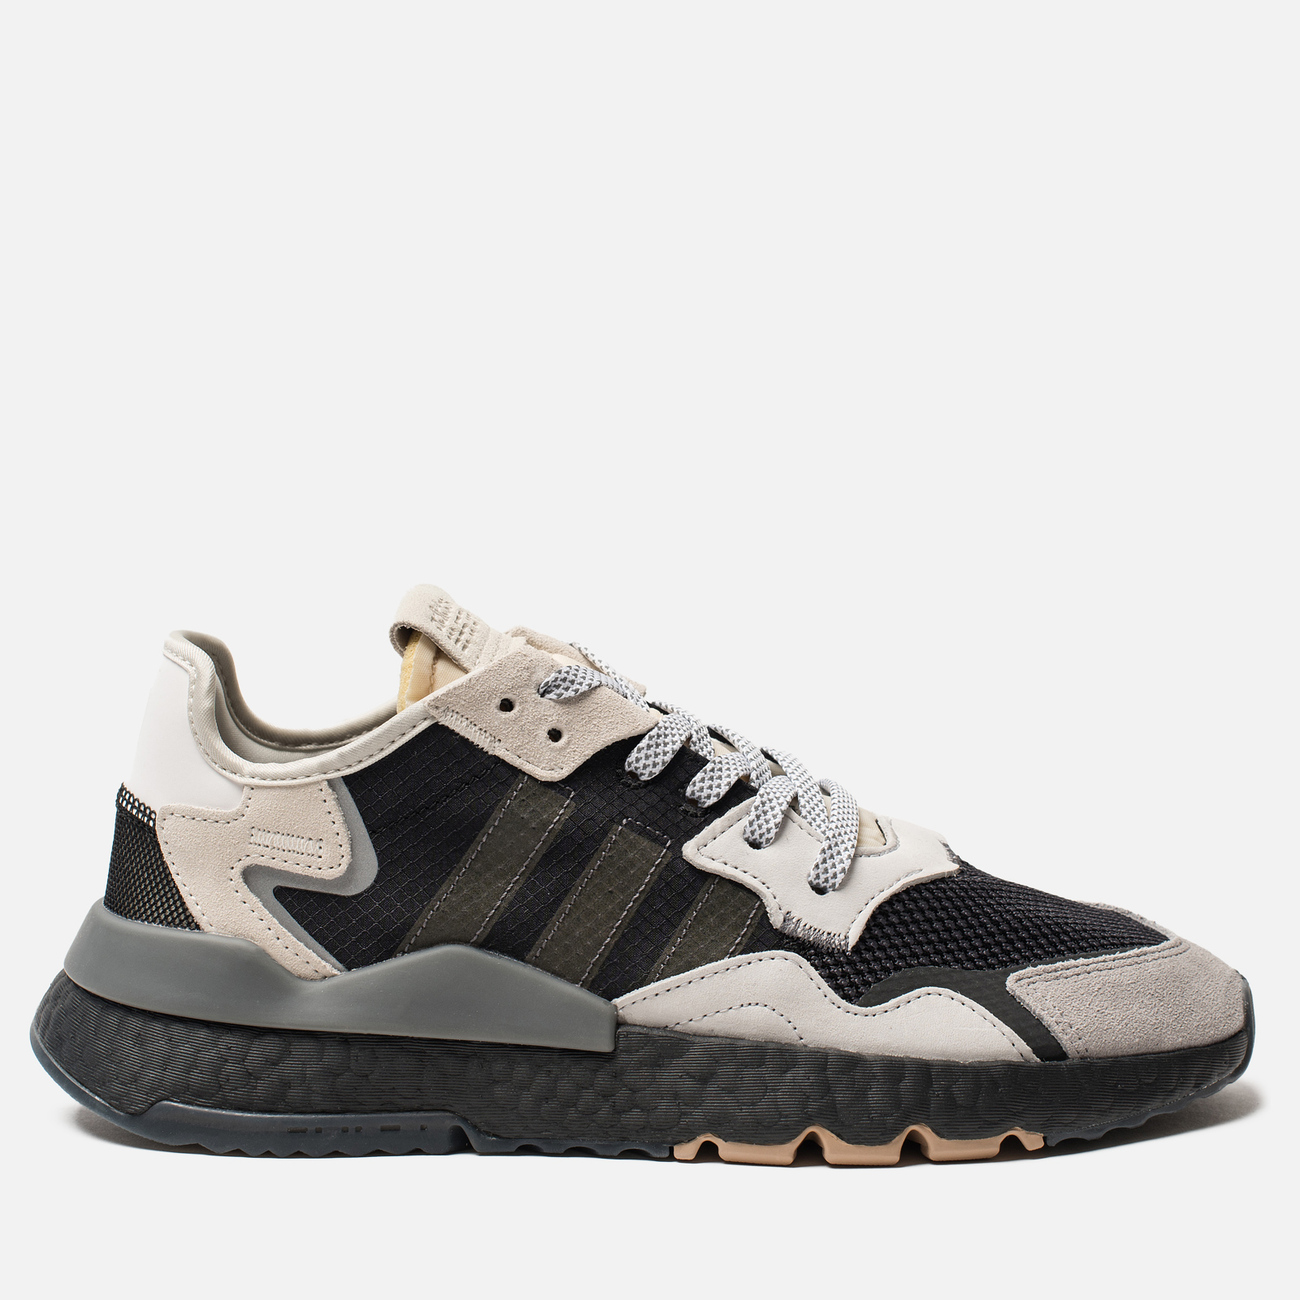 Кроссовки adidas Originals Nite Jogger Core Black/Carbon/White